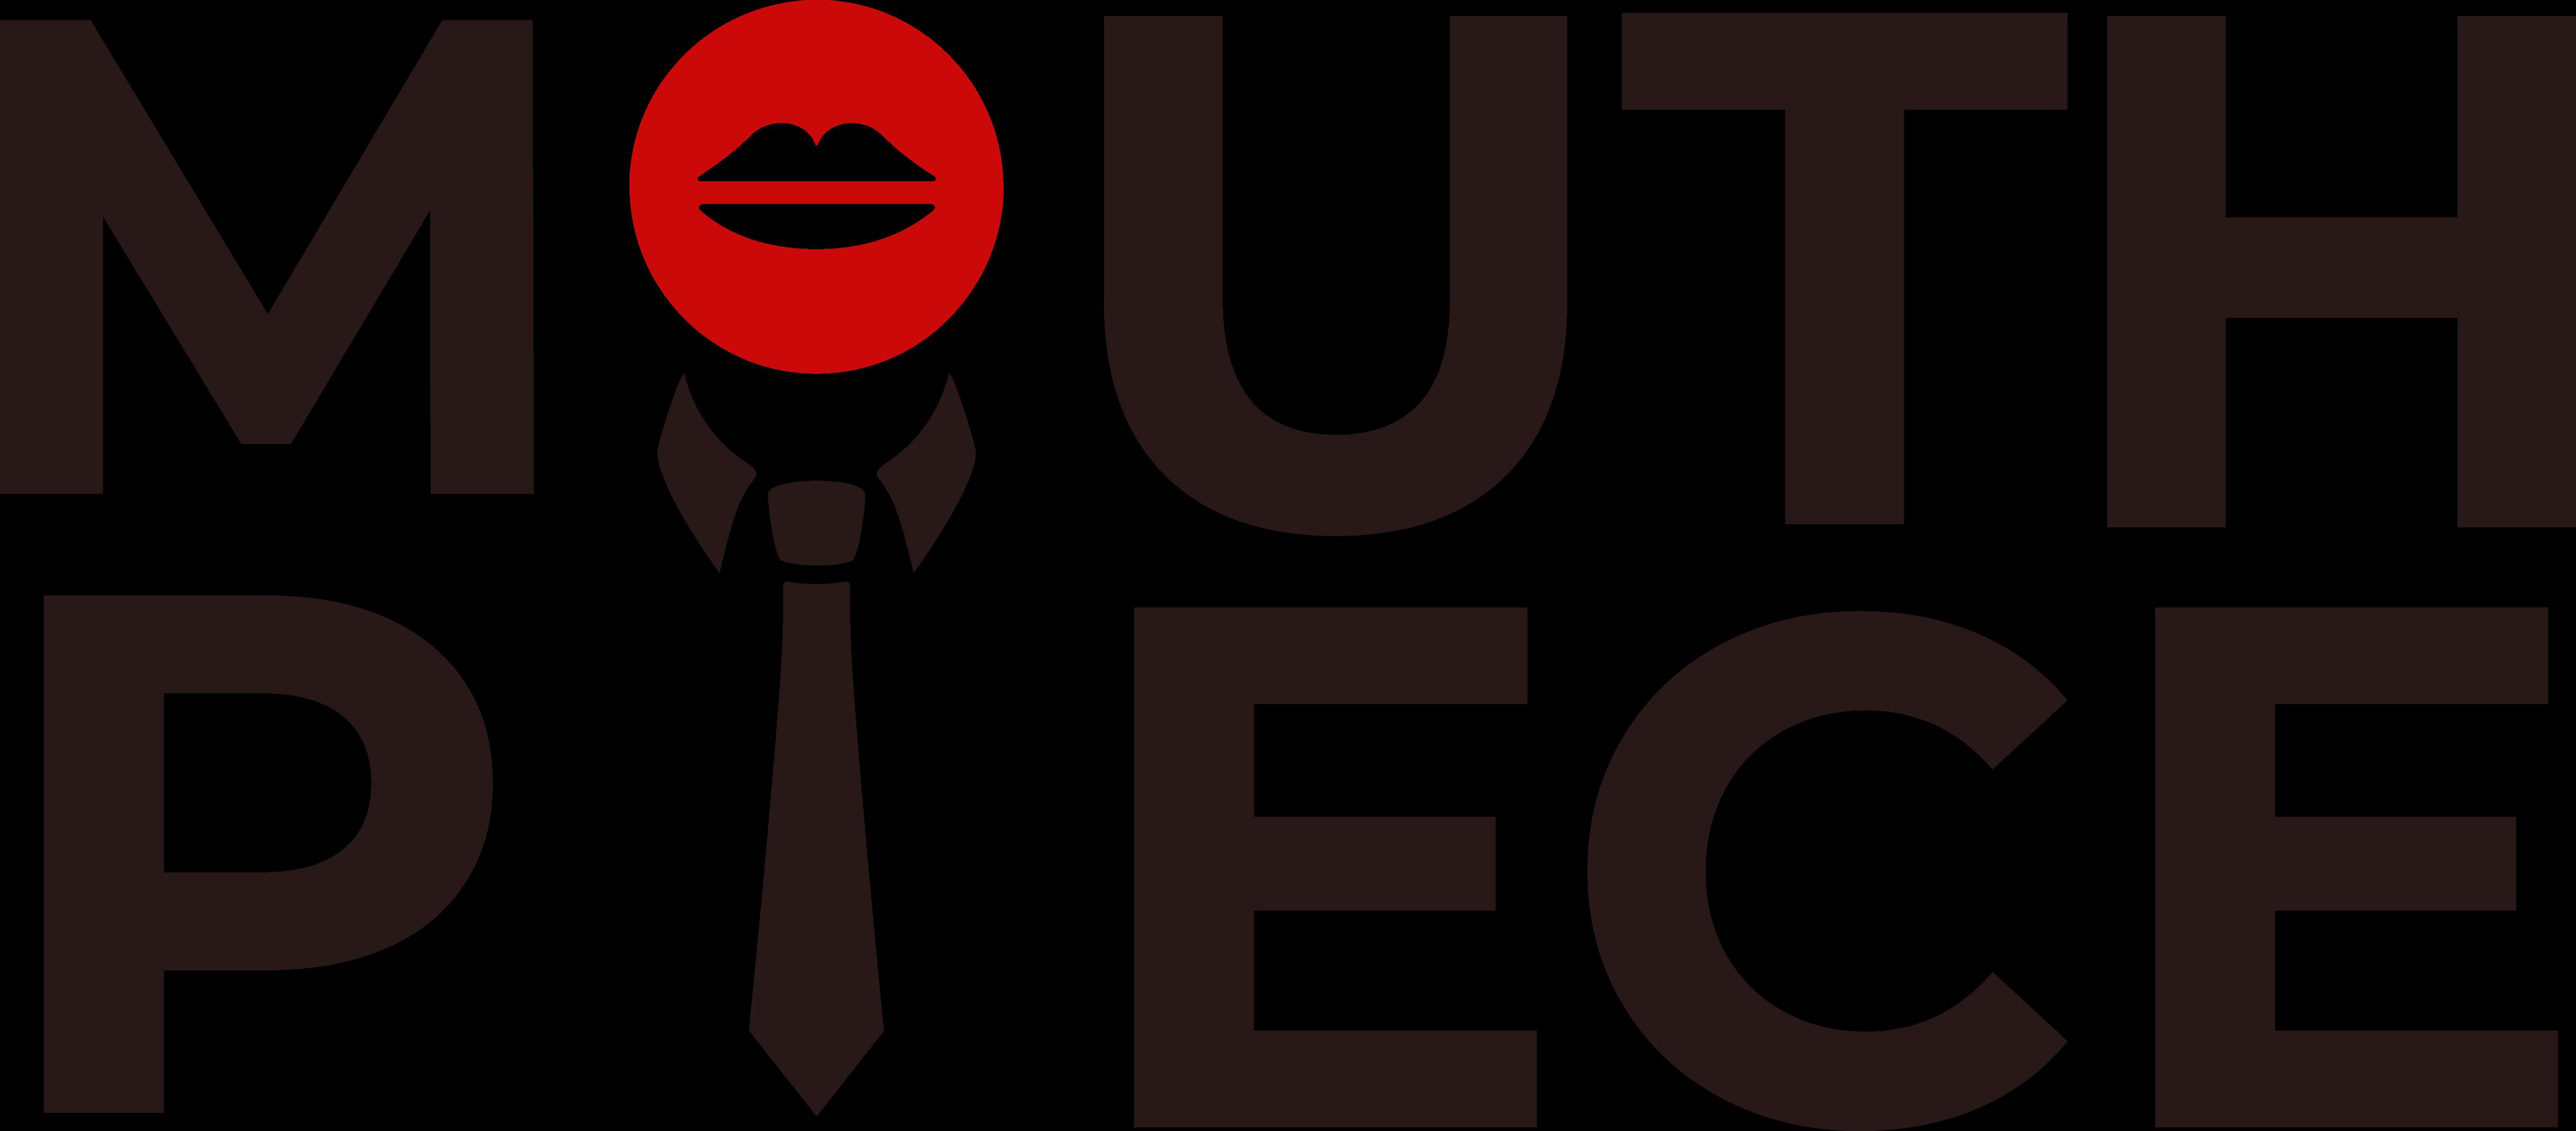 Mouthpiecelaw_logo_transparent